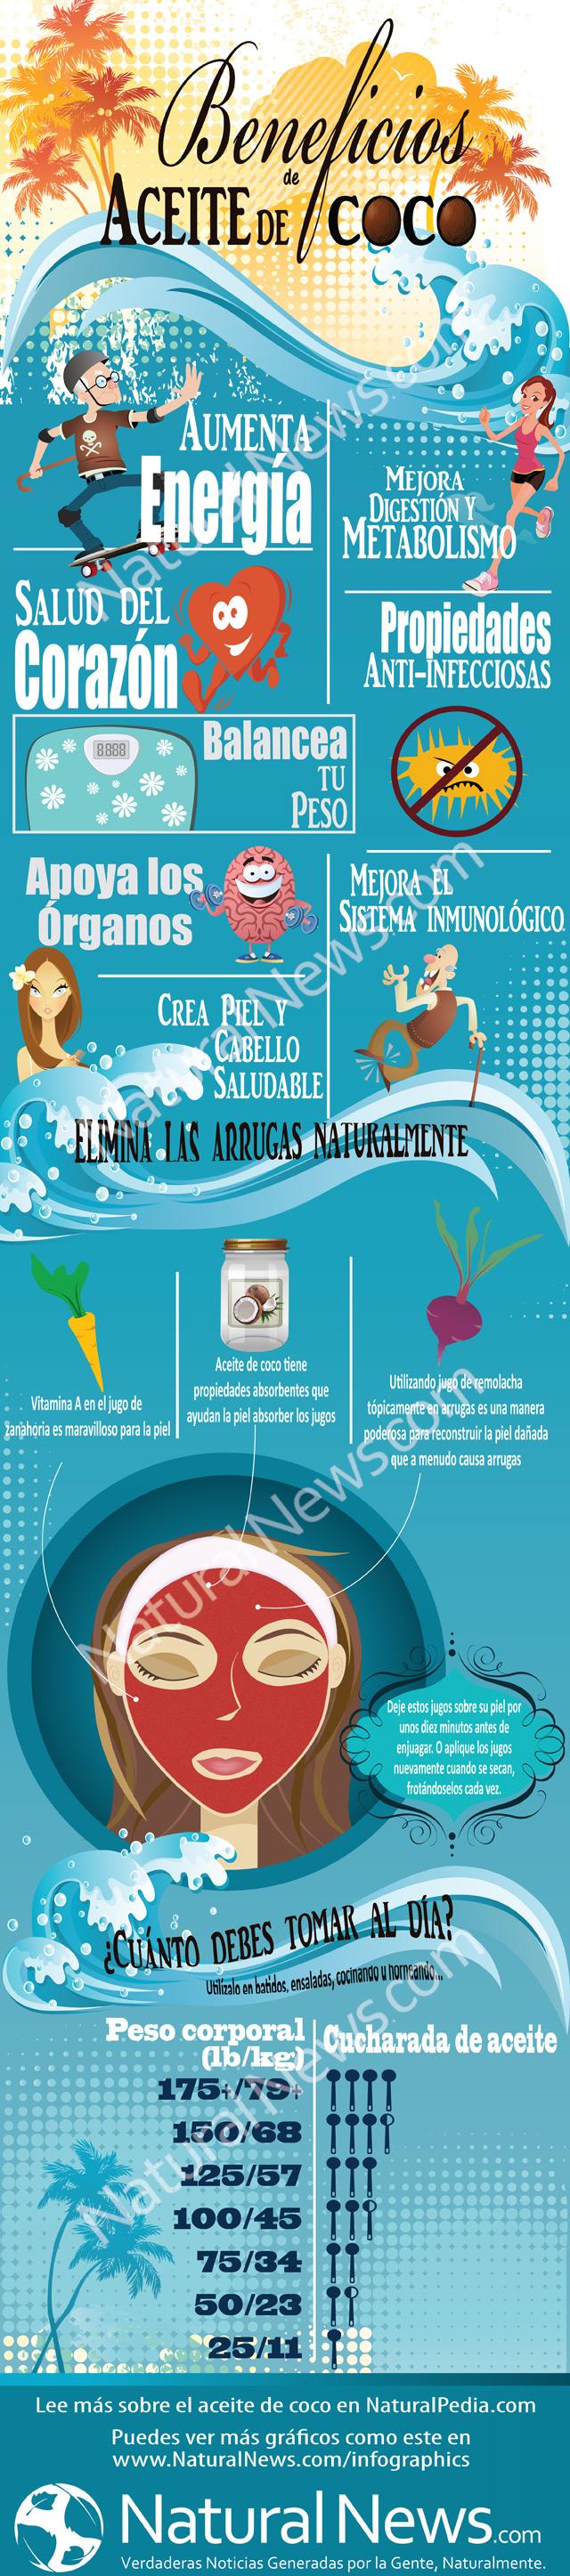 Beneficios de Aceite de Coco